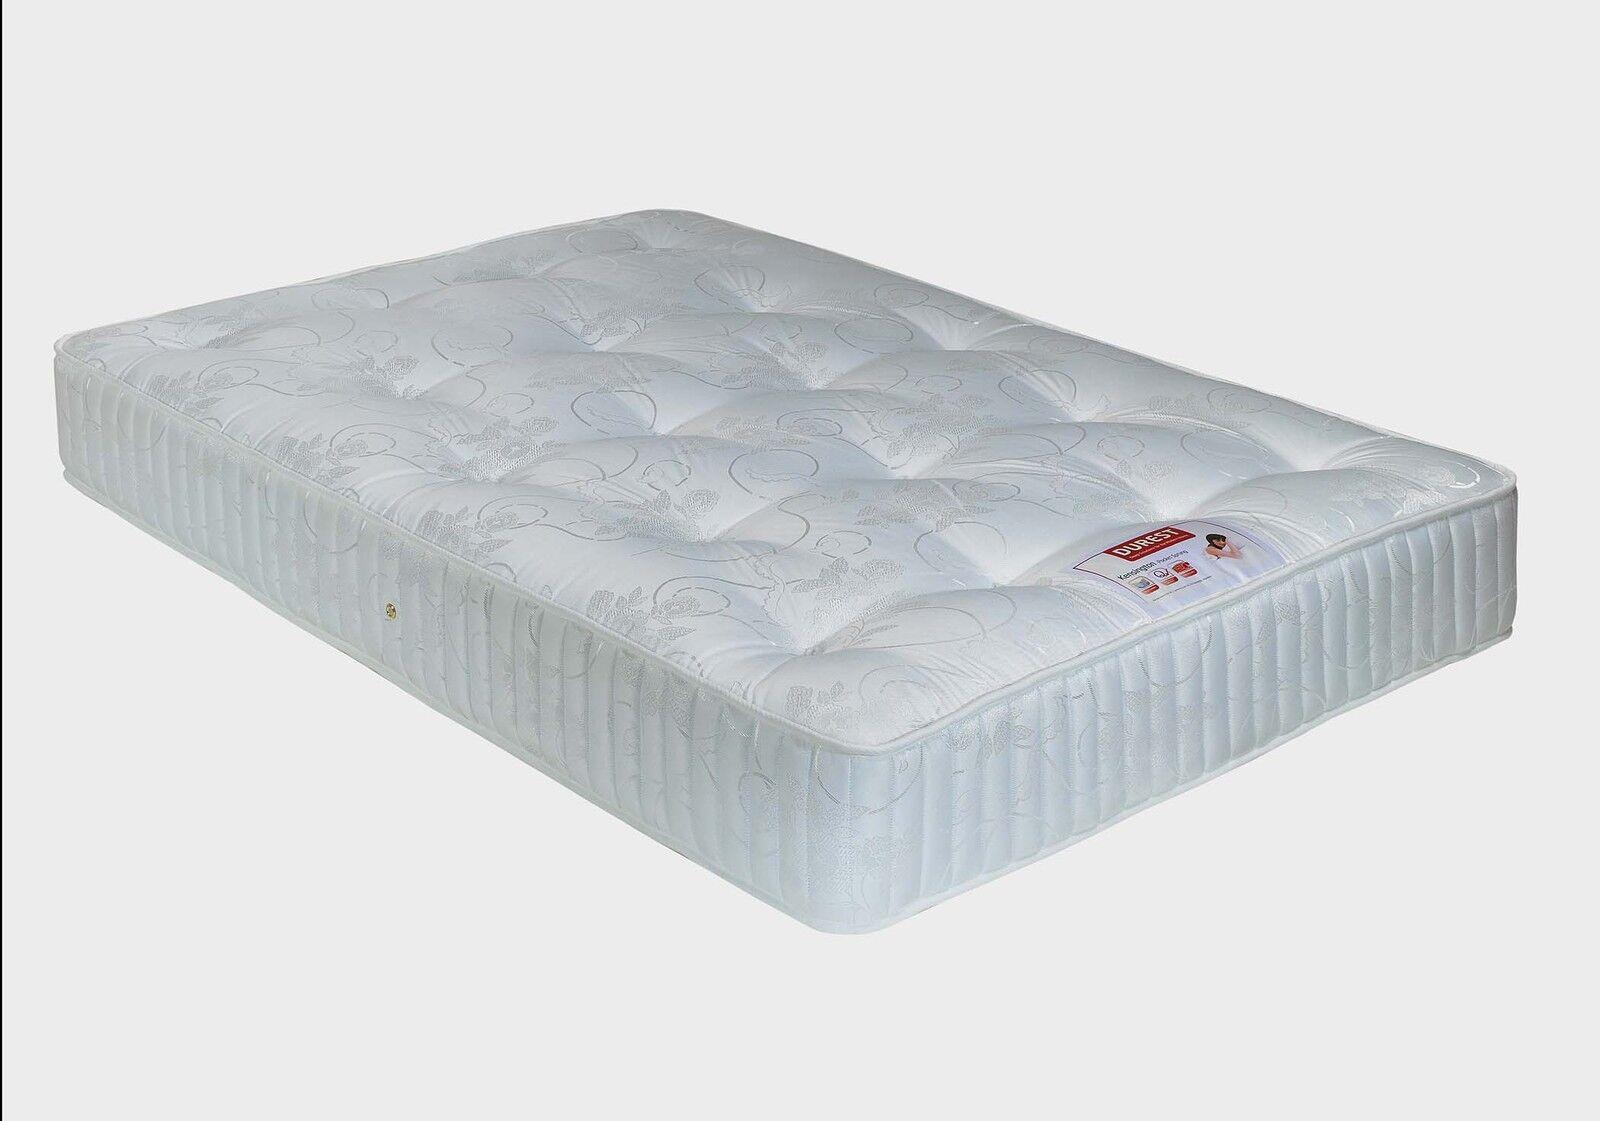 Exclusive bed world 1500 pocket sprung mattress 3ft for Pocket sprung